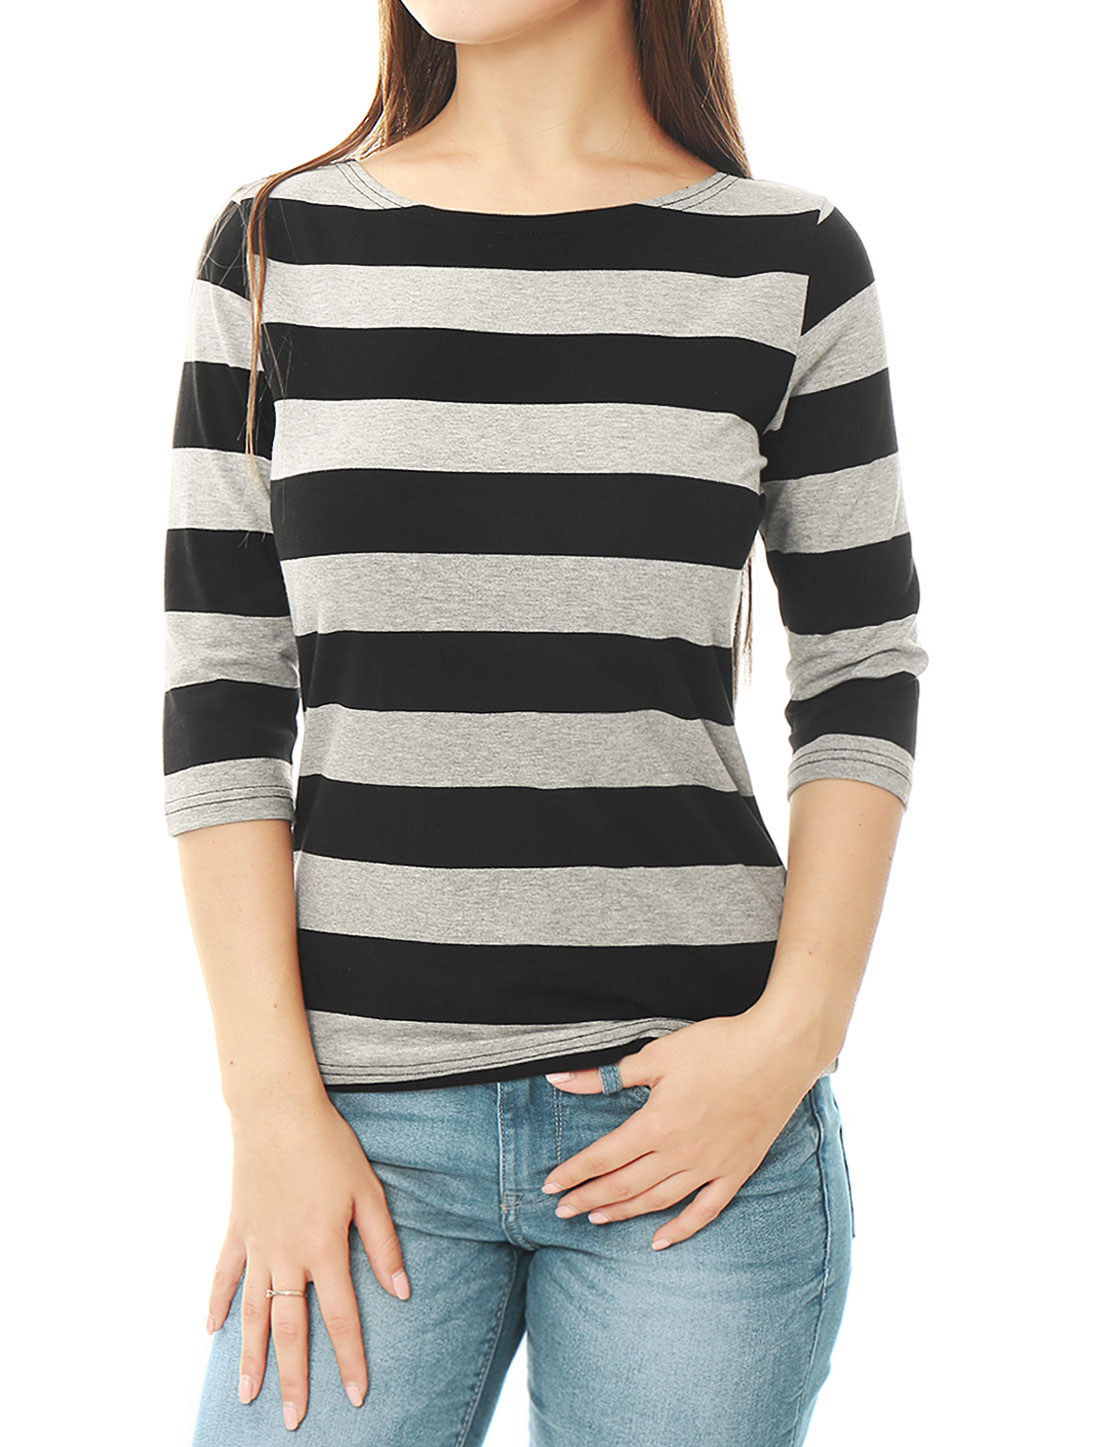 Women Elbow Sleeves Boat Neck Slim Fit Striped Tee Black M